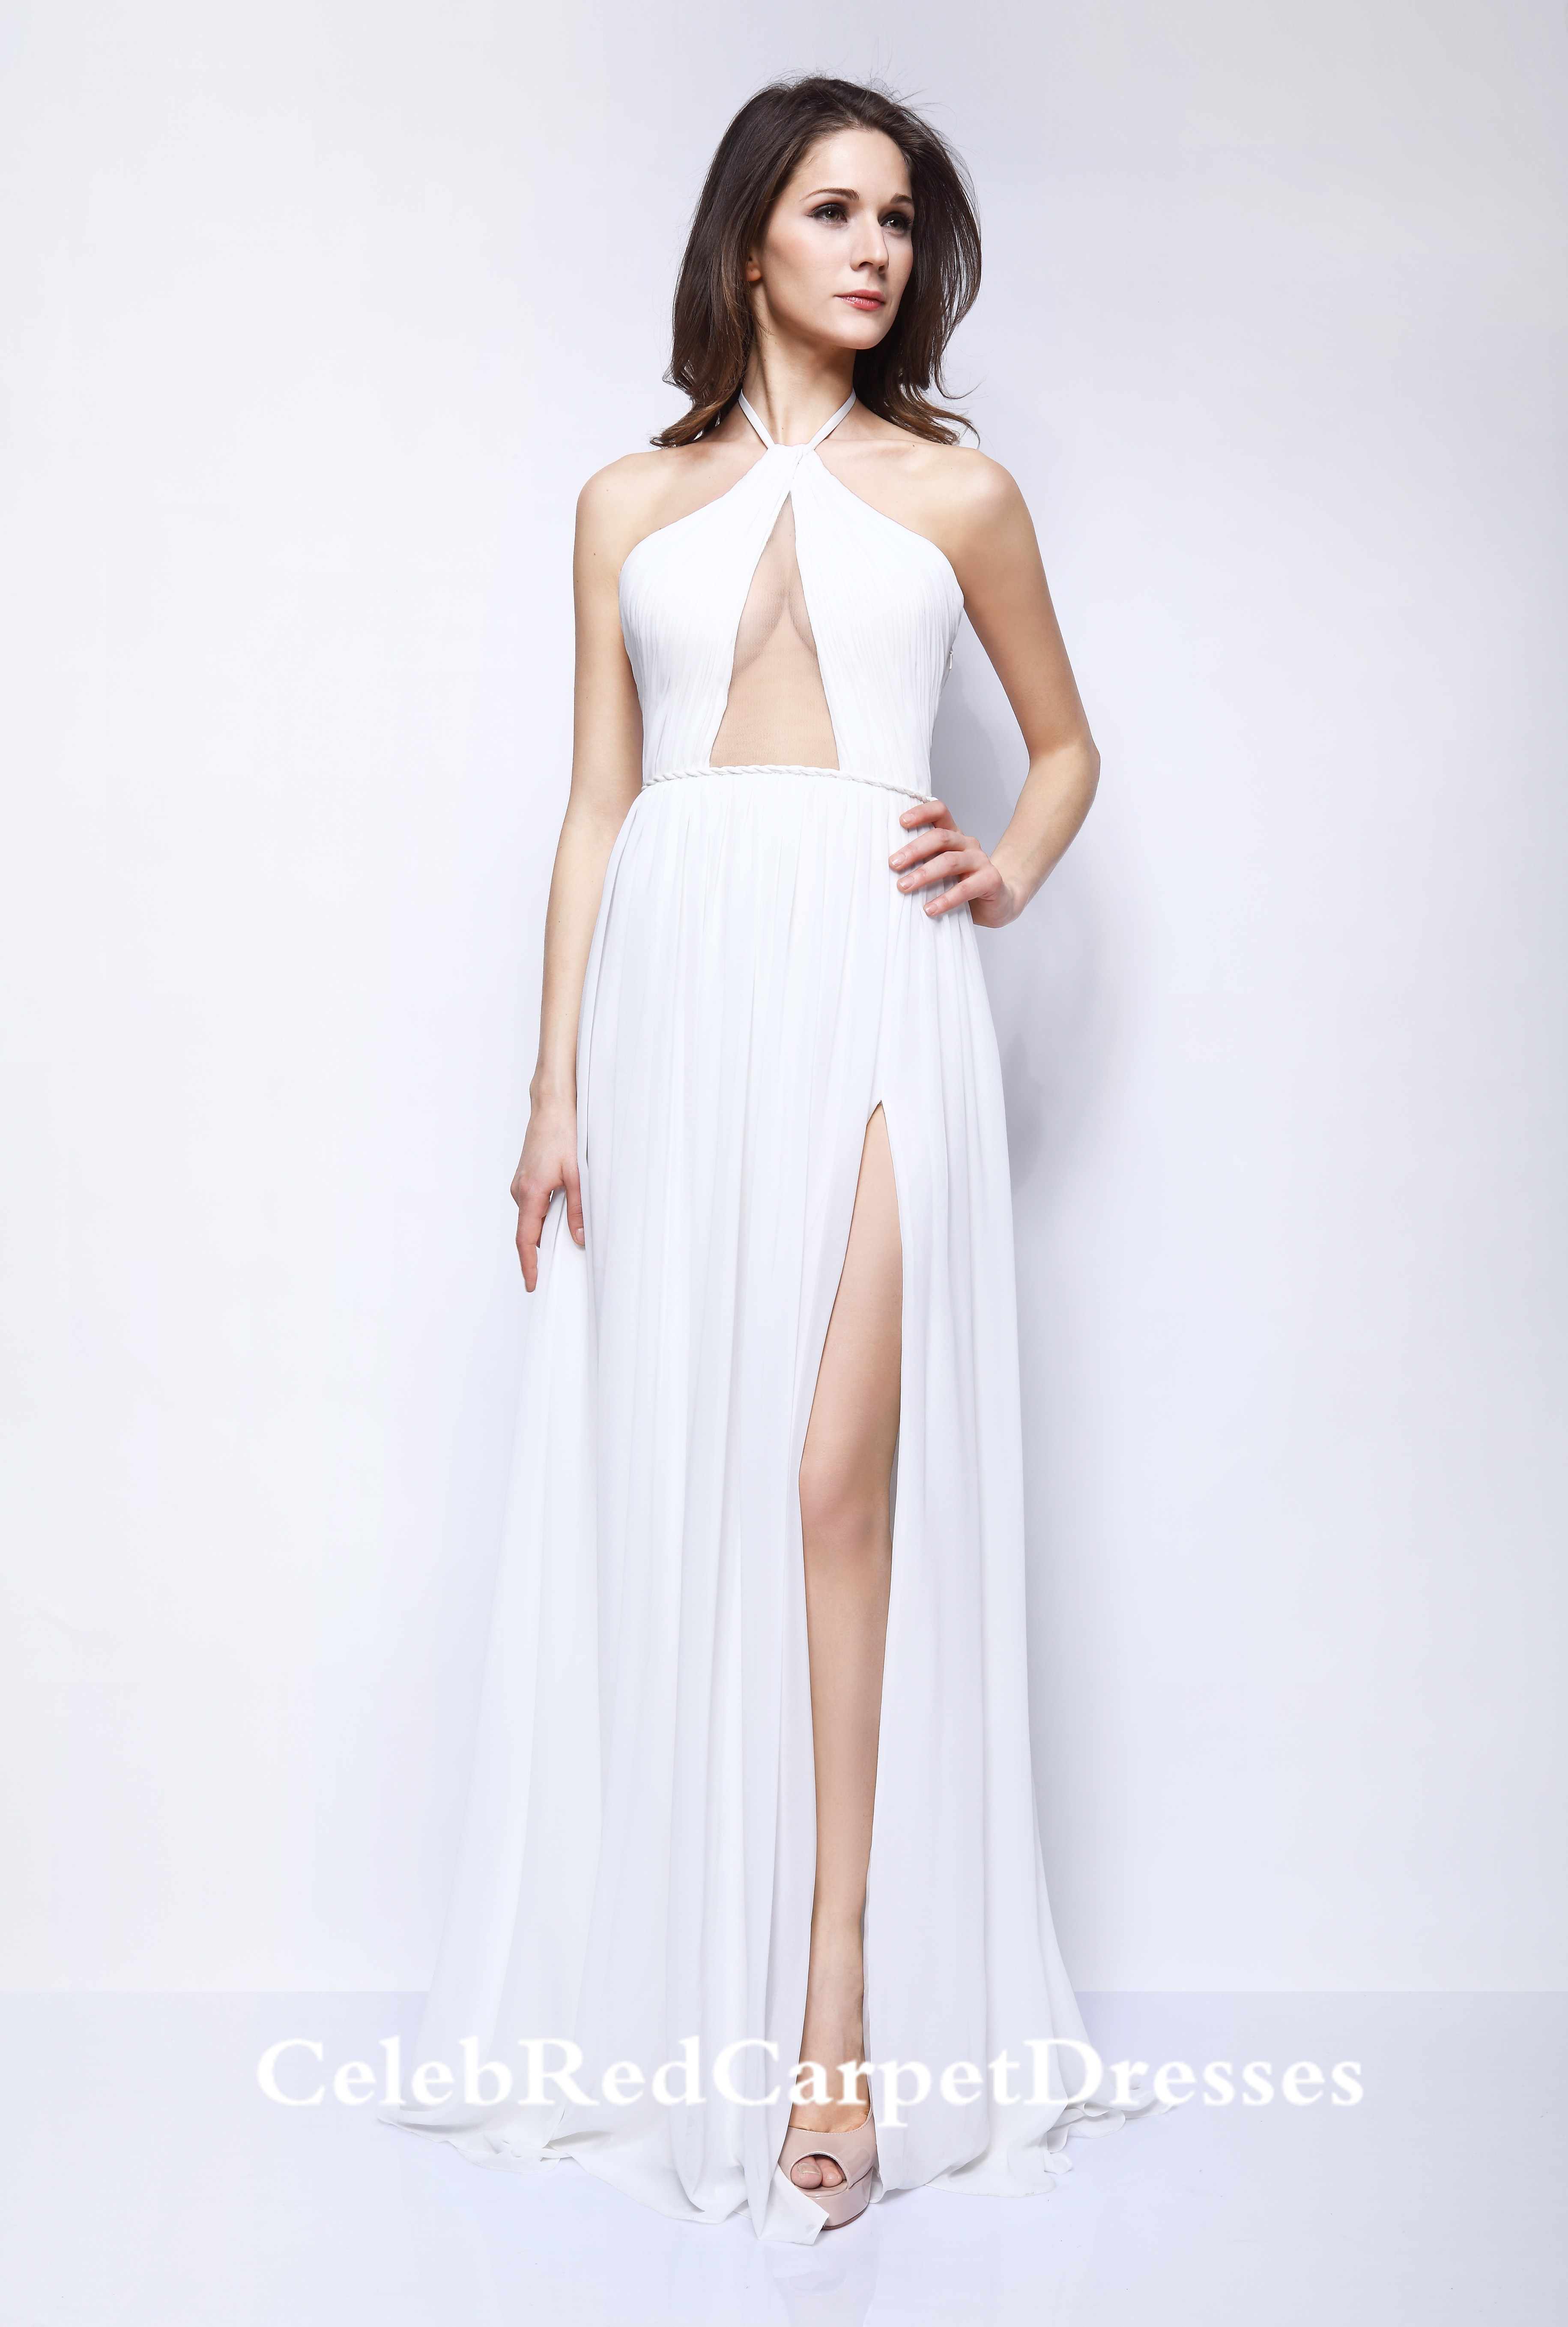 Taylor Swift White Chiffon Dress Fragrance Foundation Awards 2013